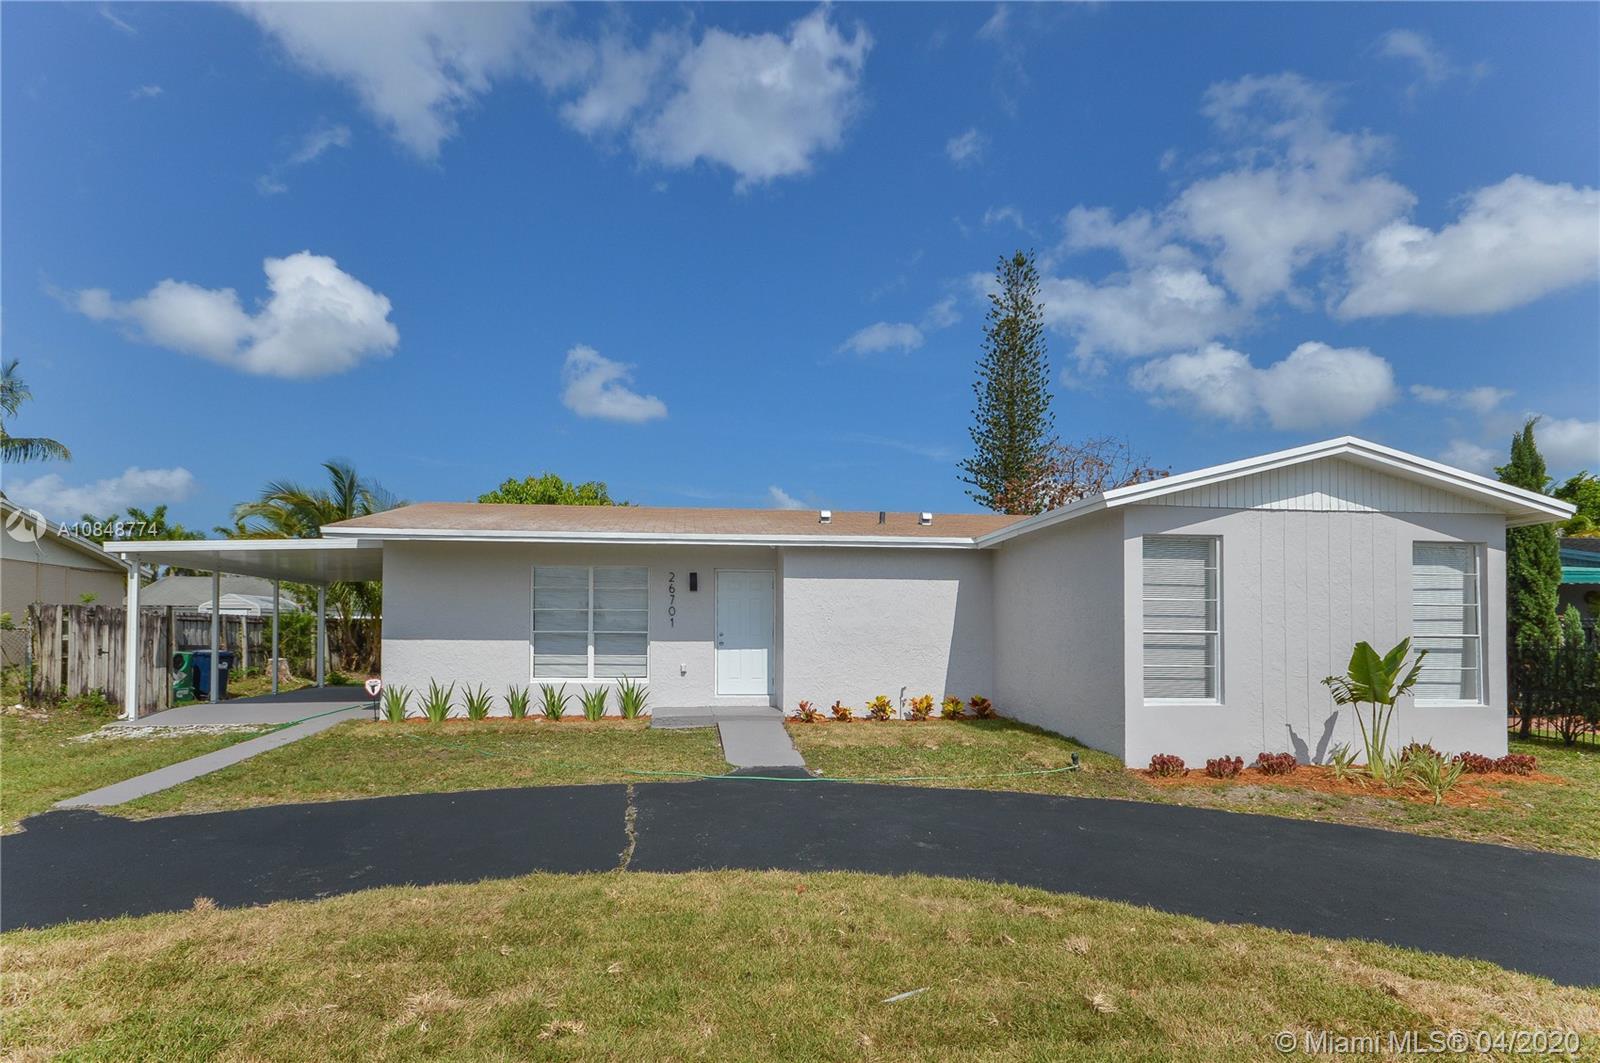 26701 SW 127th Ave, Homestead, FL 33032 - Homestead, FL real estate listing